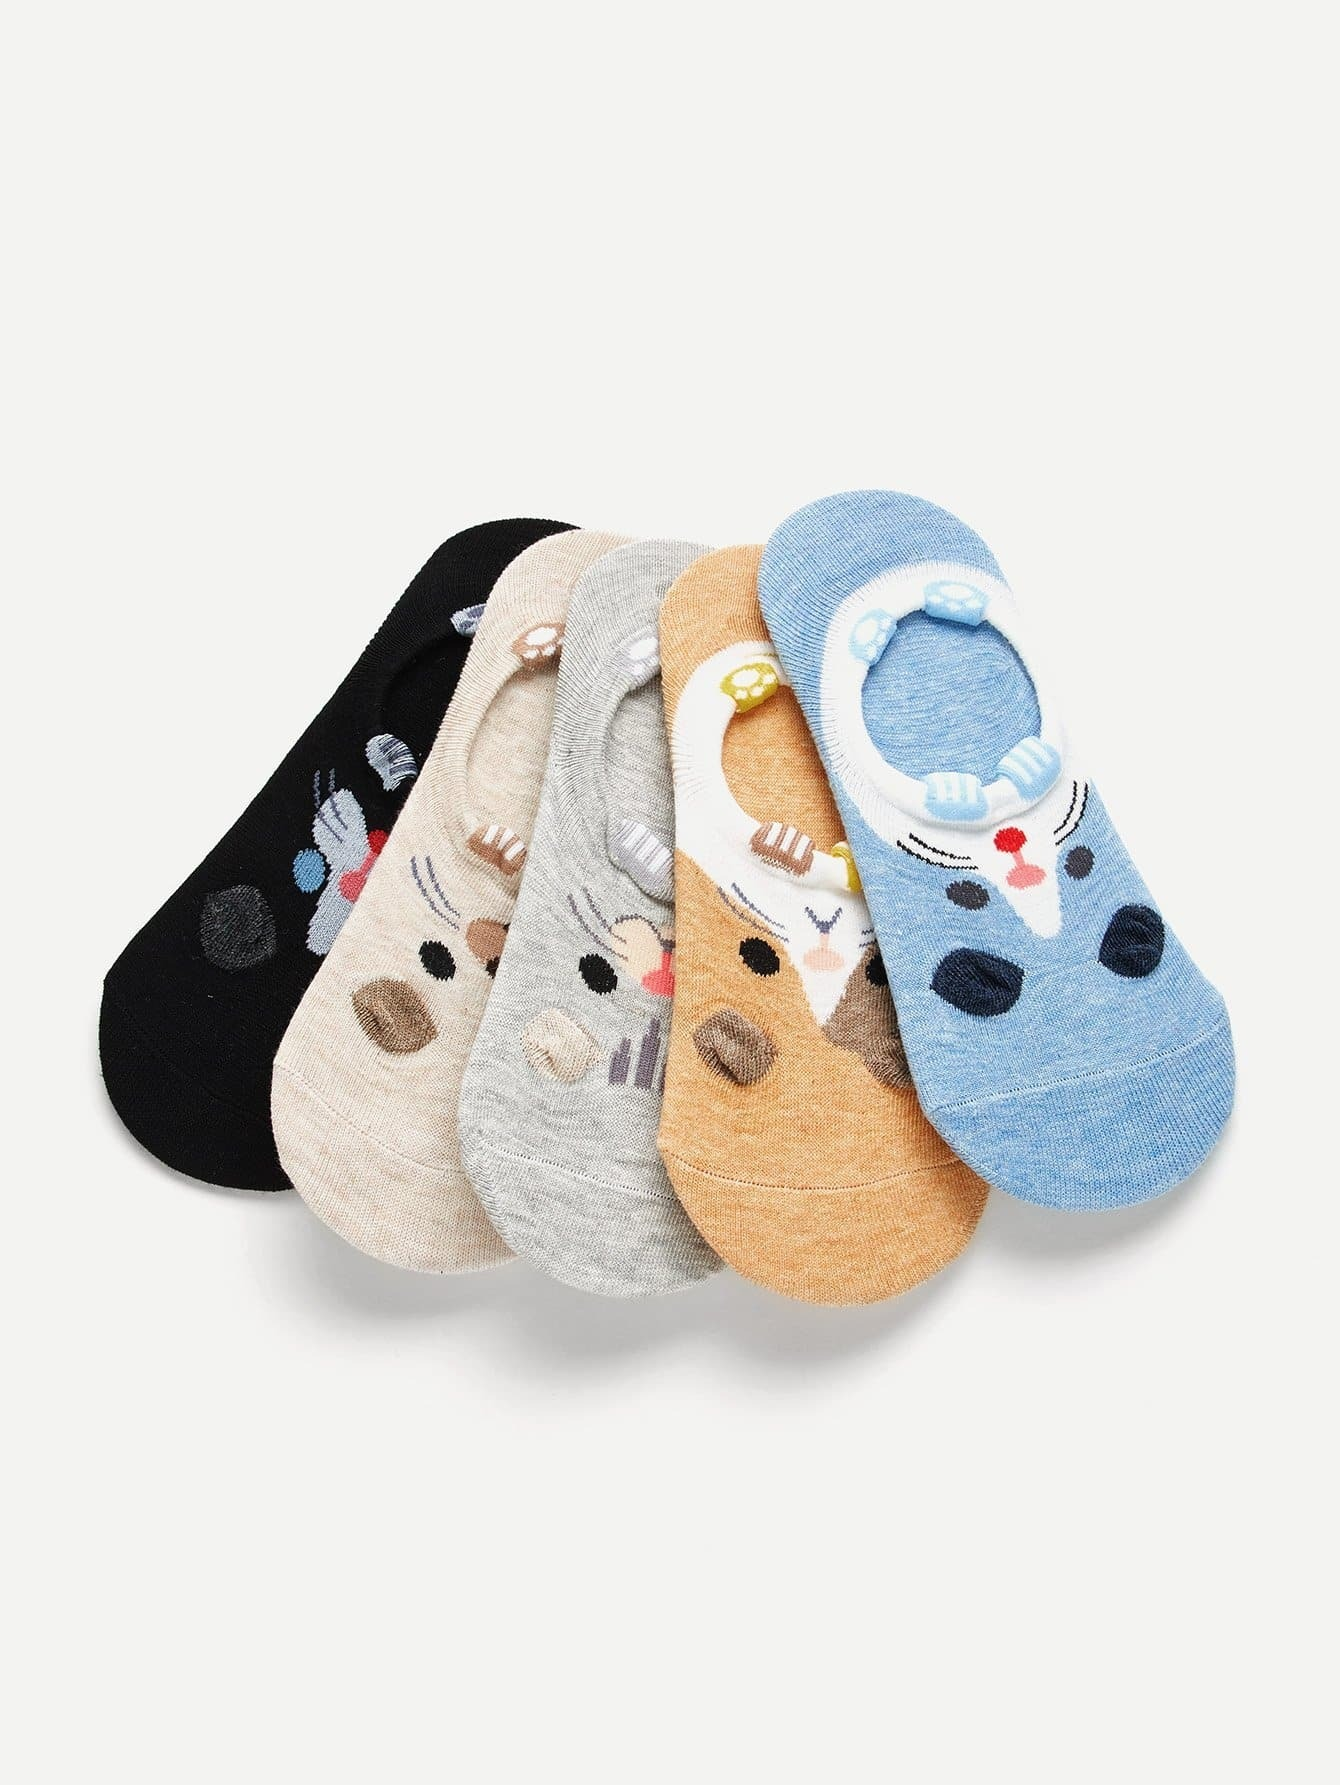 Animal Pattern Invisible Socks 5pairs animal embroidery invisible socks 3pairs